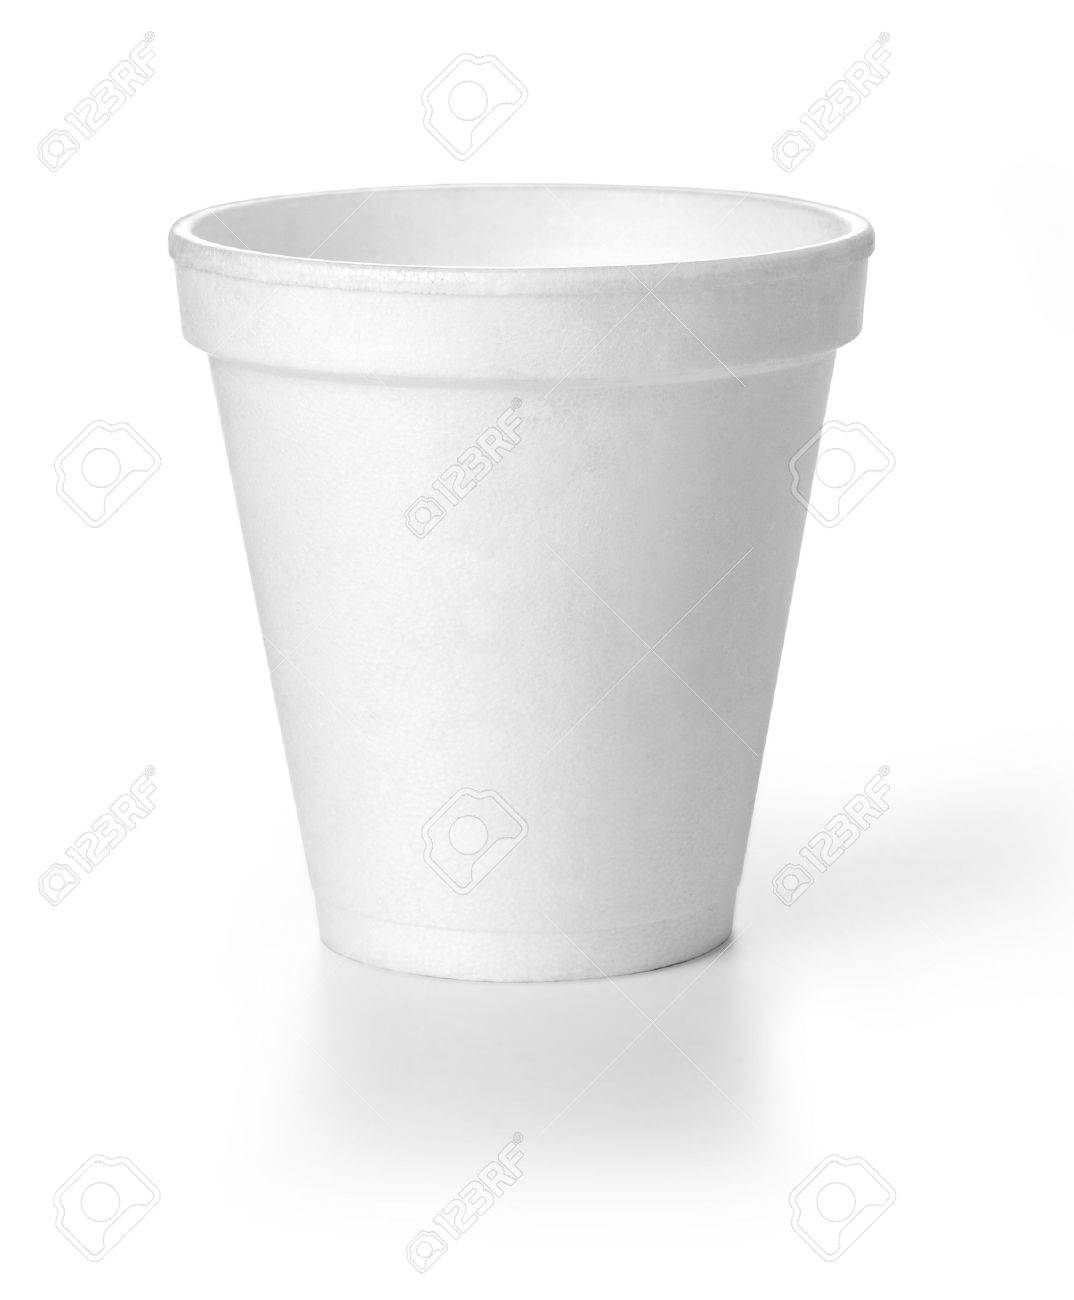 Polistren foam takeaway coffe cup with clipping path - 49210024